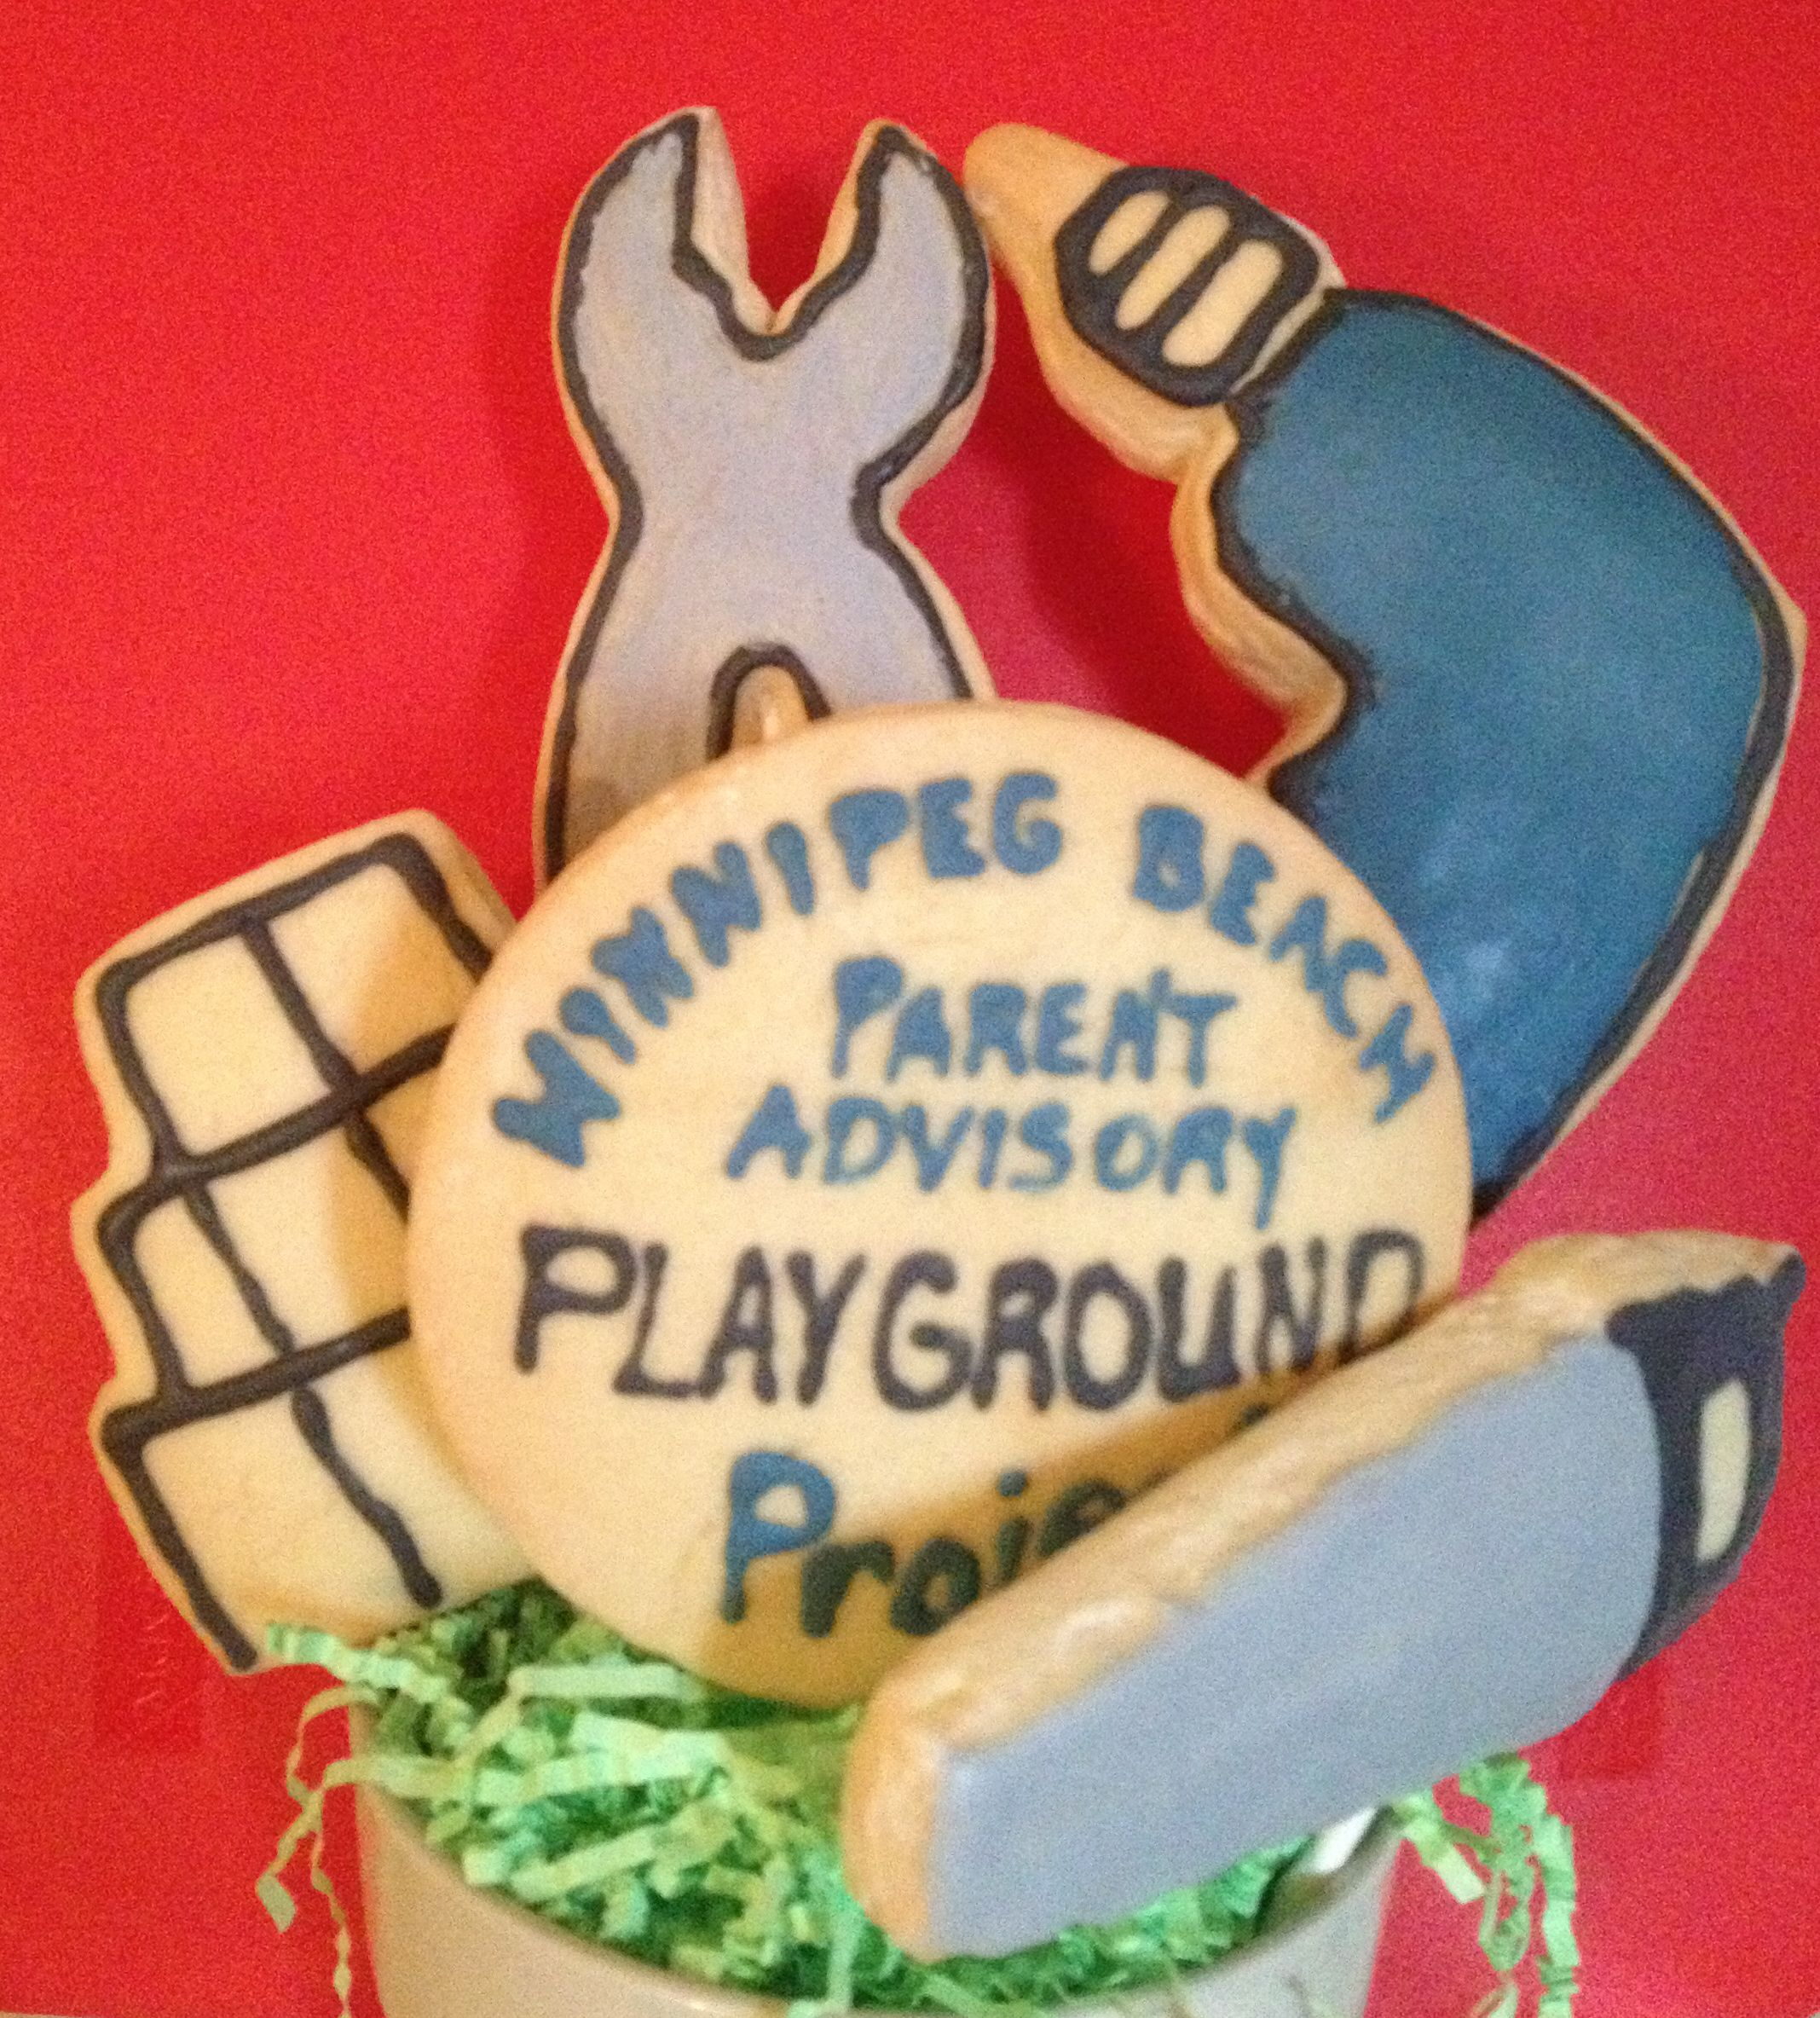 Playground Fundraiser Bouquet Fundraising, Sugar cookie